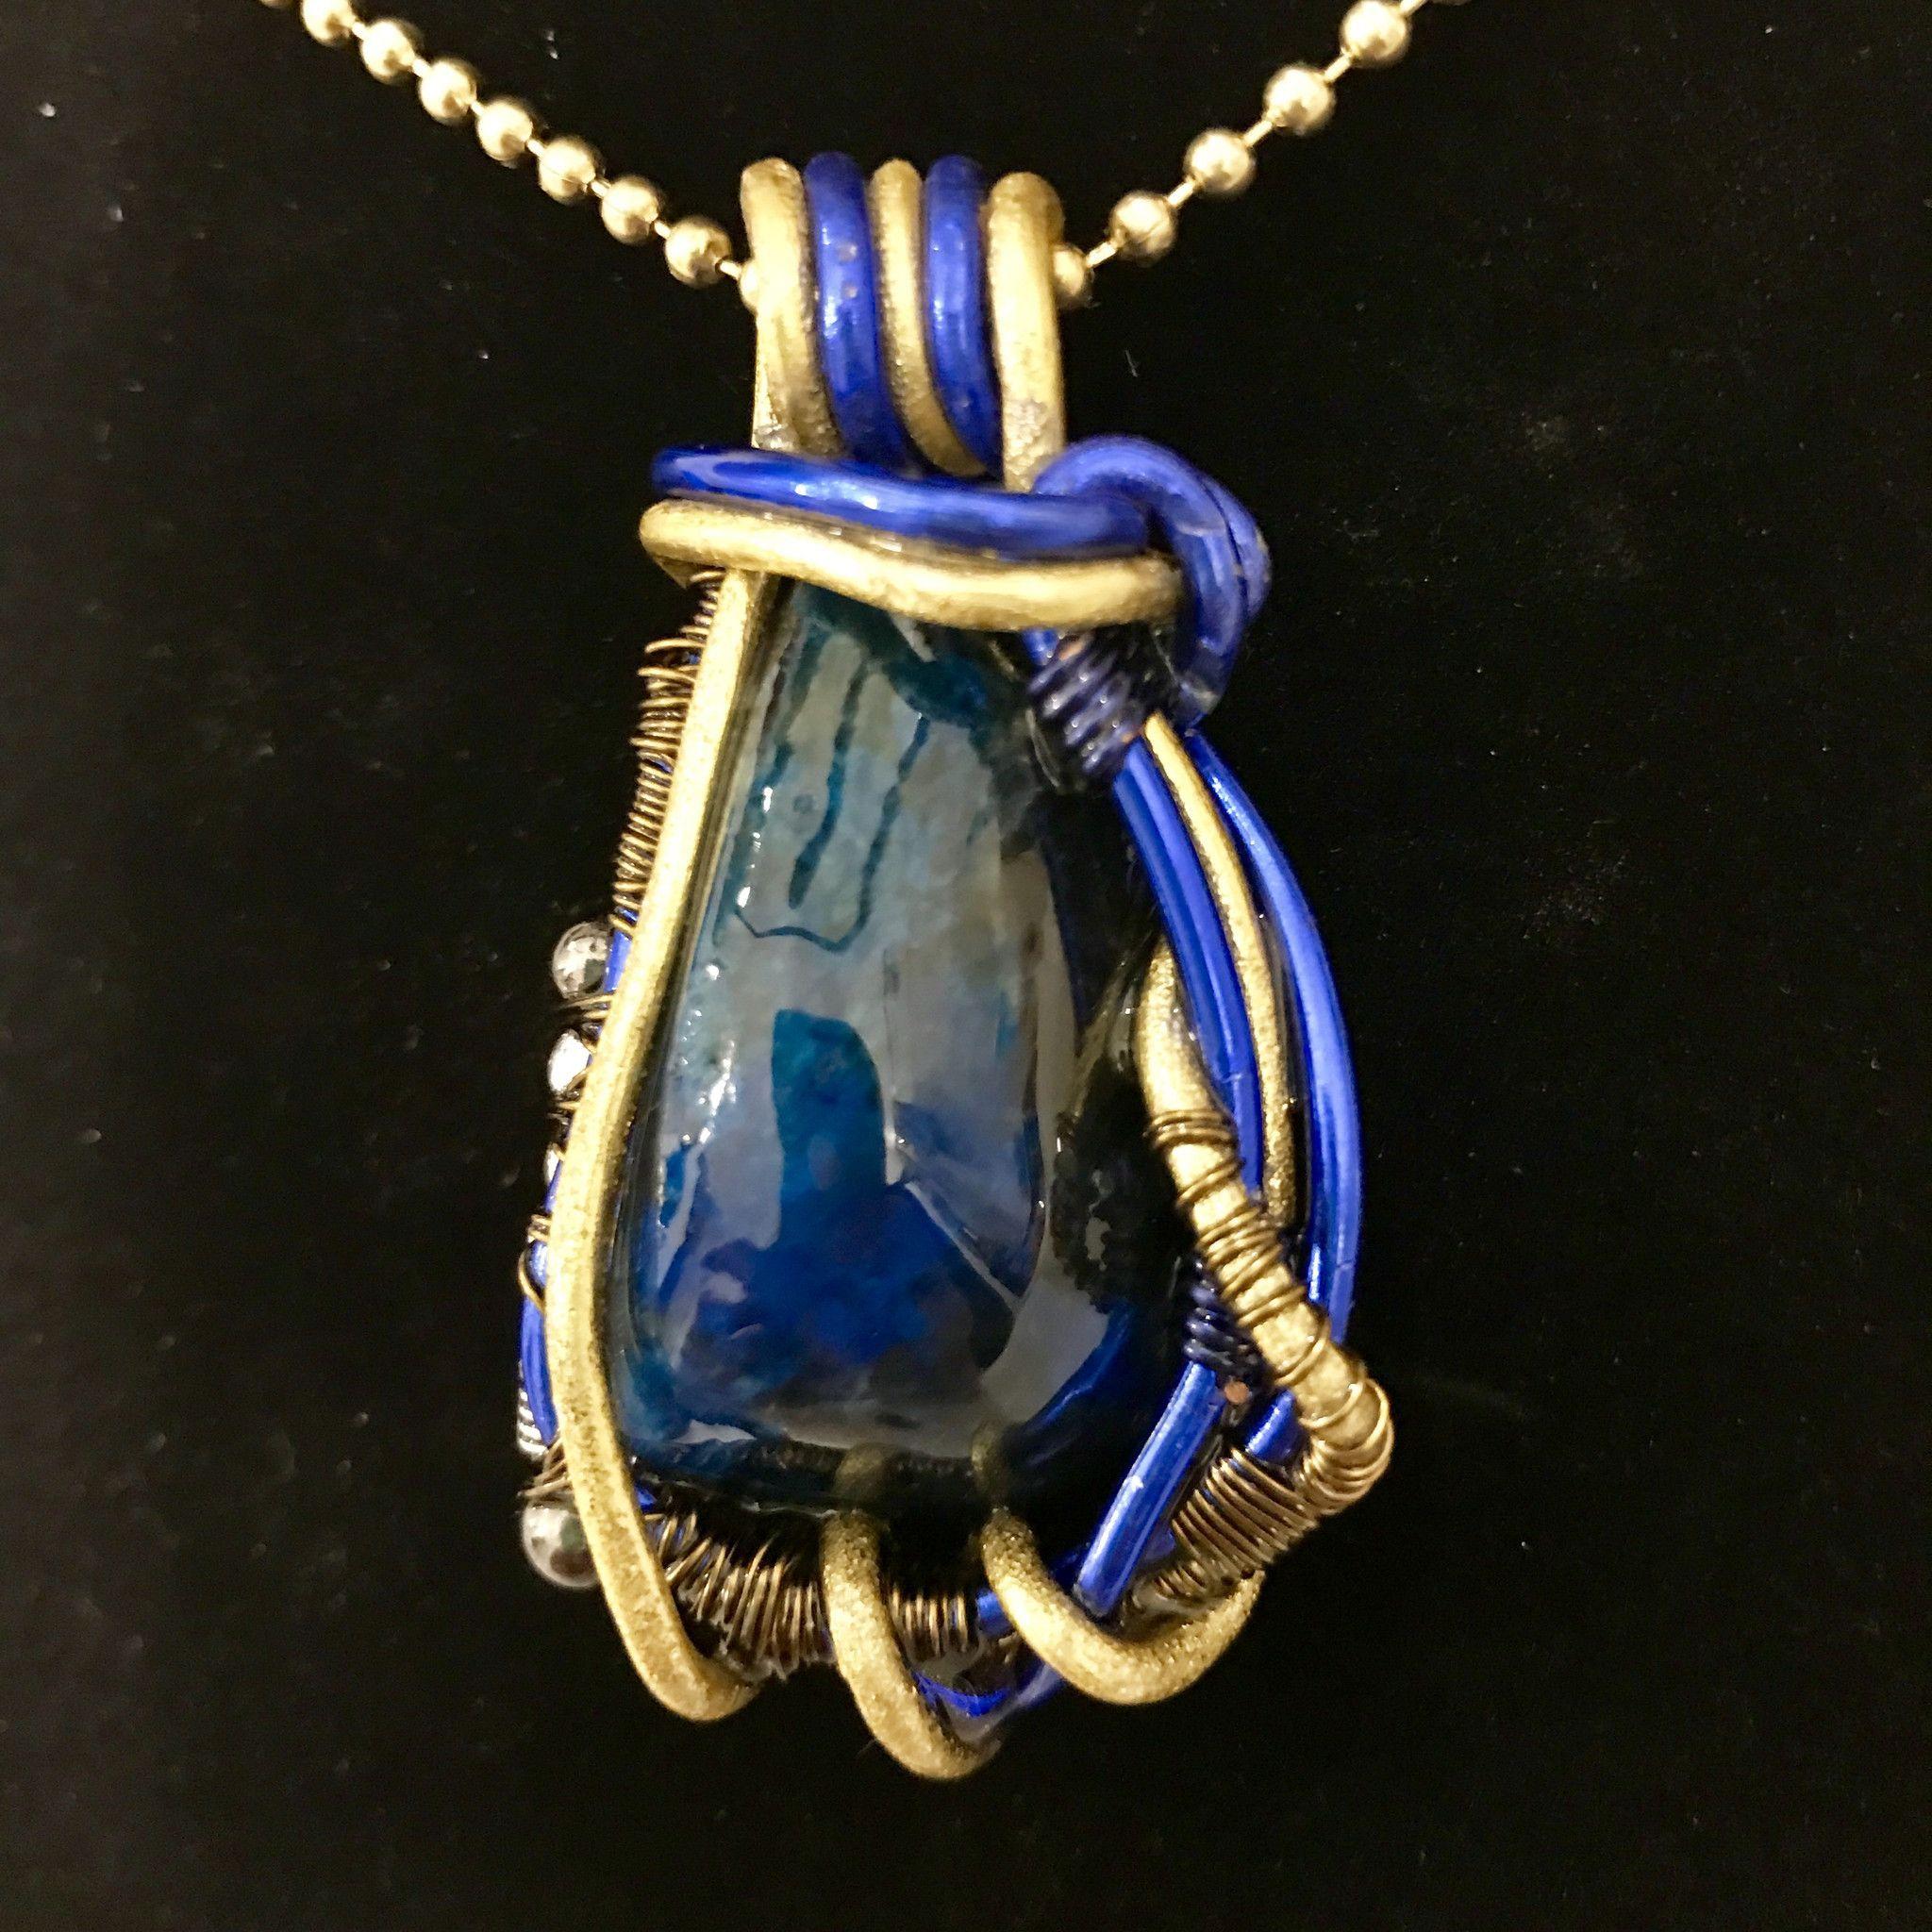 Genesis Blue necklace